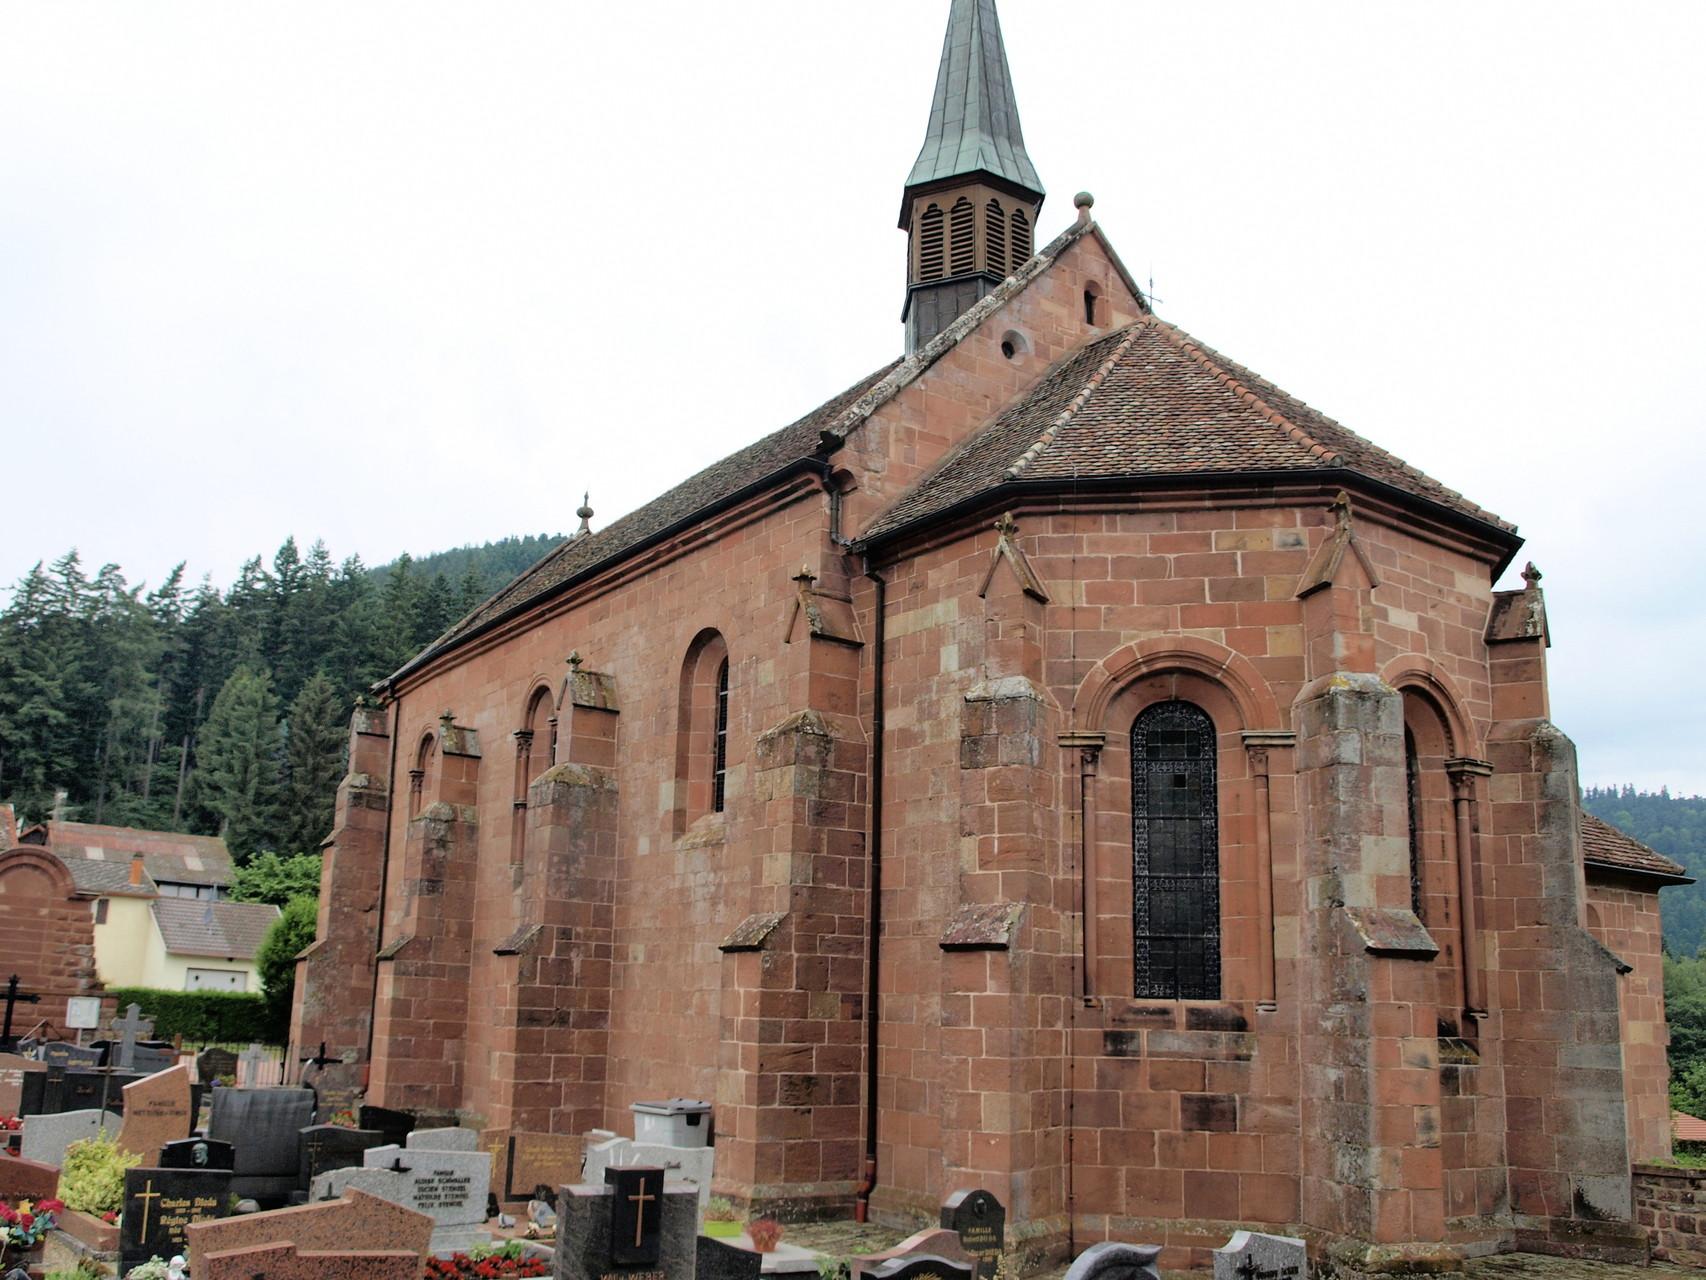 Obersteigen : chapelle de l'Assomption